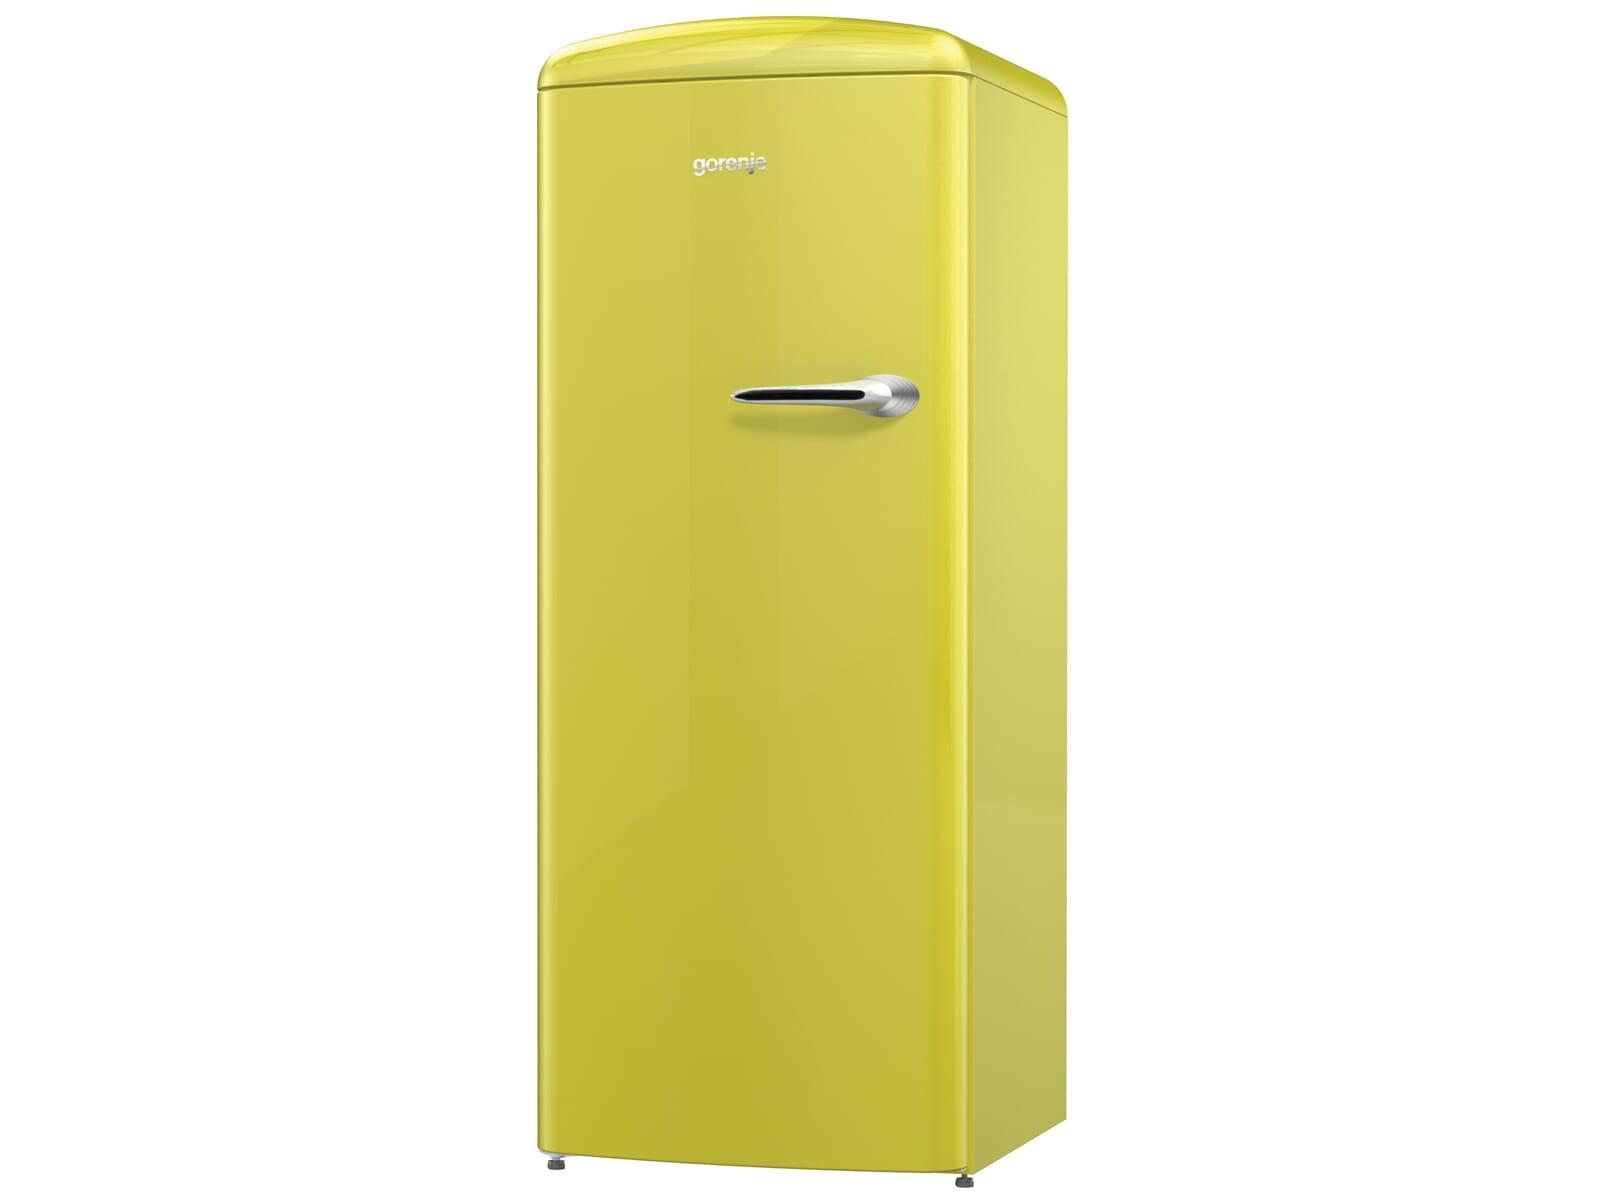 Gorenje Kühlschrank Crispzone : Gorenje r lx vollraumkühlschrank höhe cm a